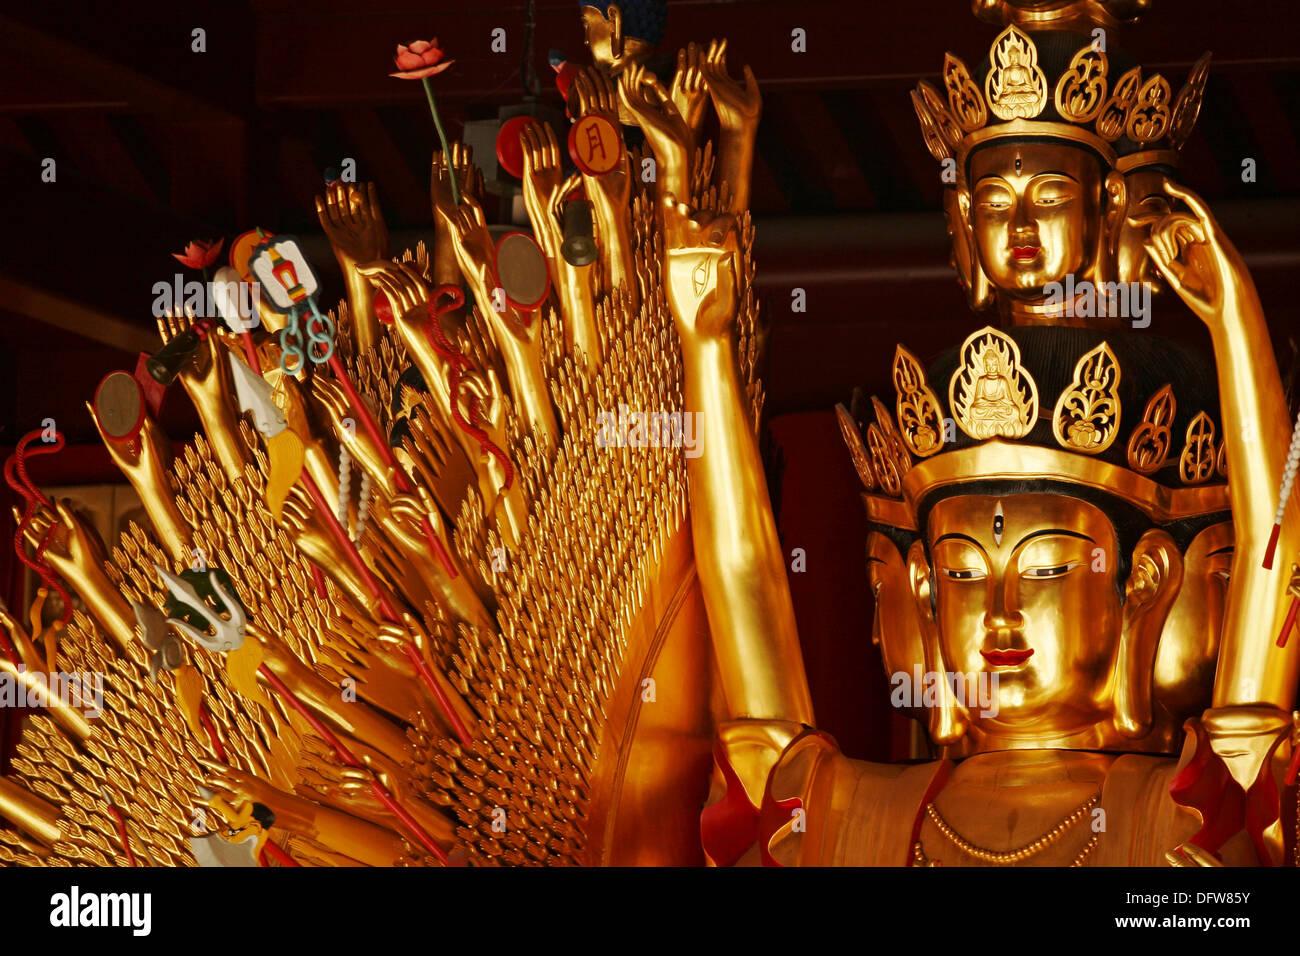 Avalokitesvara Buddha Guan-Yin, with a thousand hands and eyes, International Buddhist Temple, Richmond, Canada Stock Photo